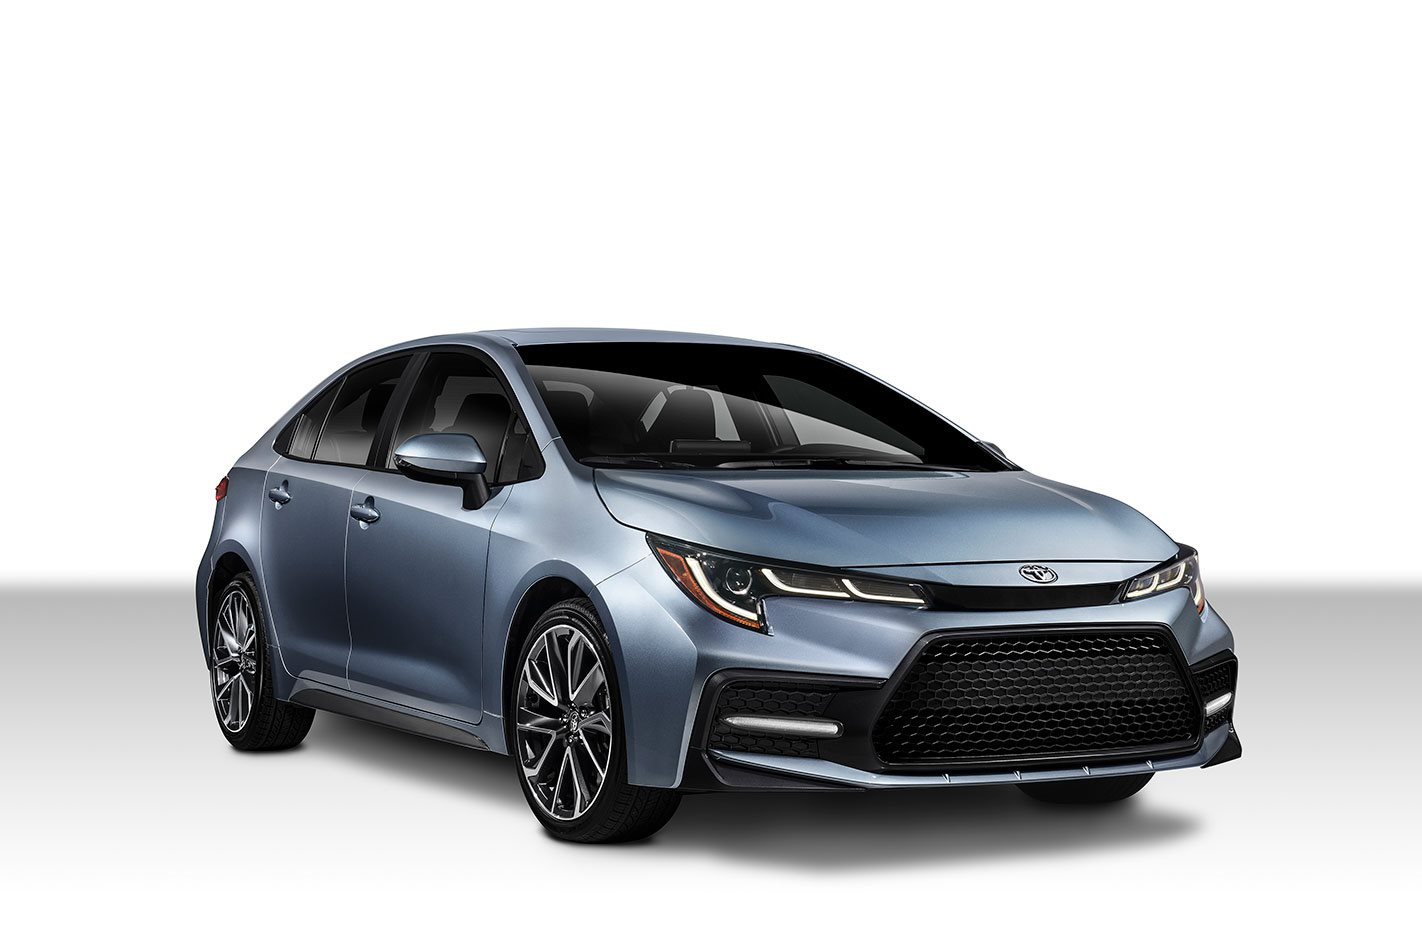 2019 Toyota Corolla Sedan Image Gallery